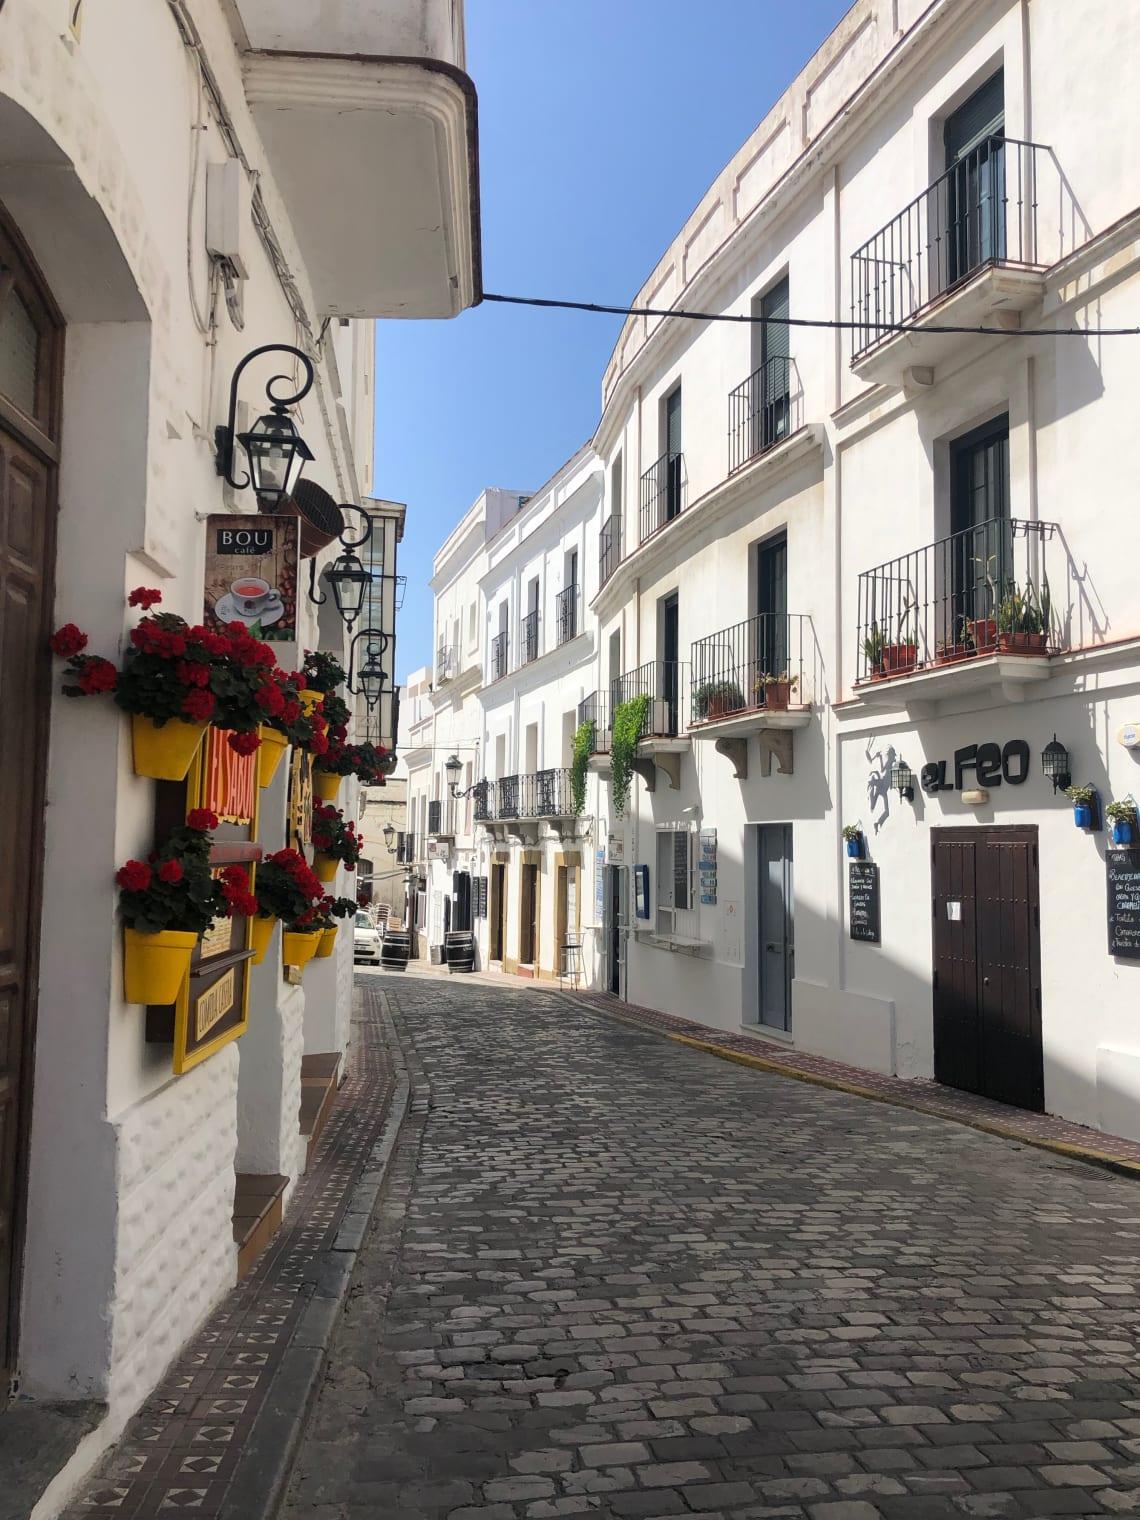 Guía completa para viajar a Tarifa - worldpackers - casco histórico de Tarifa, España